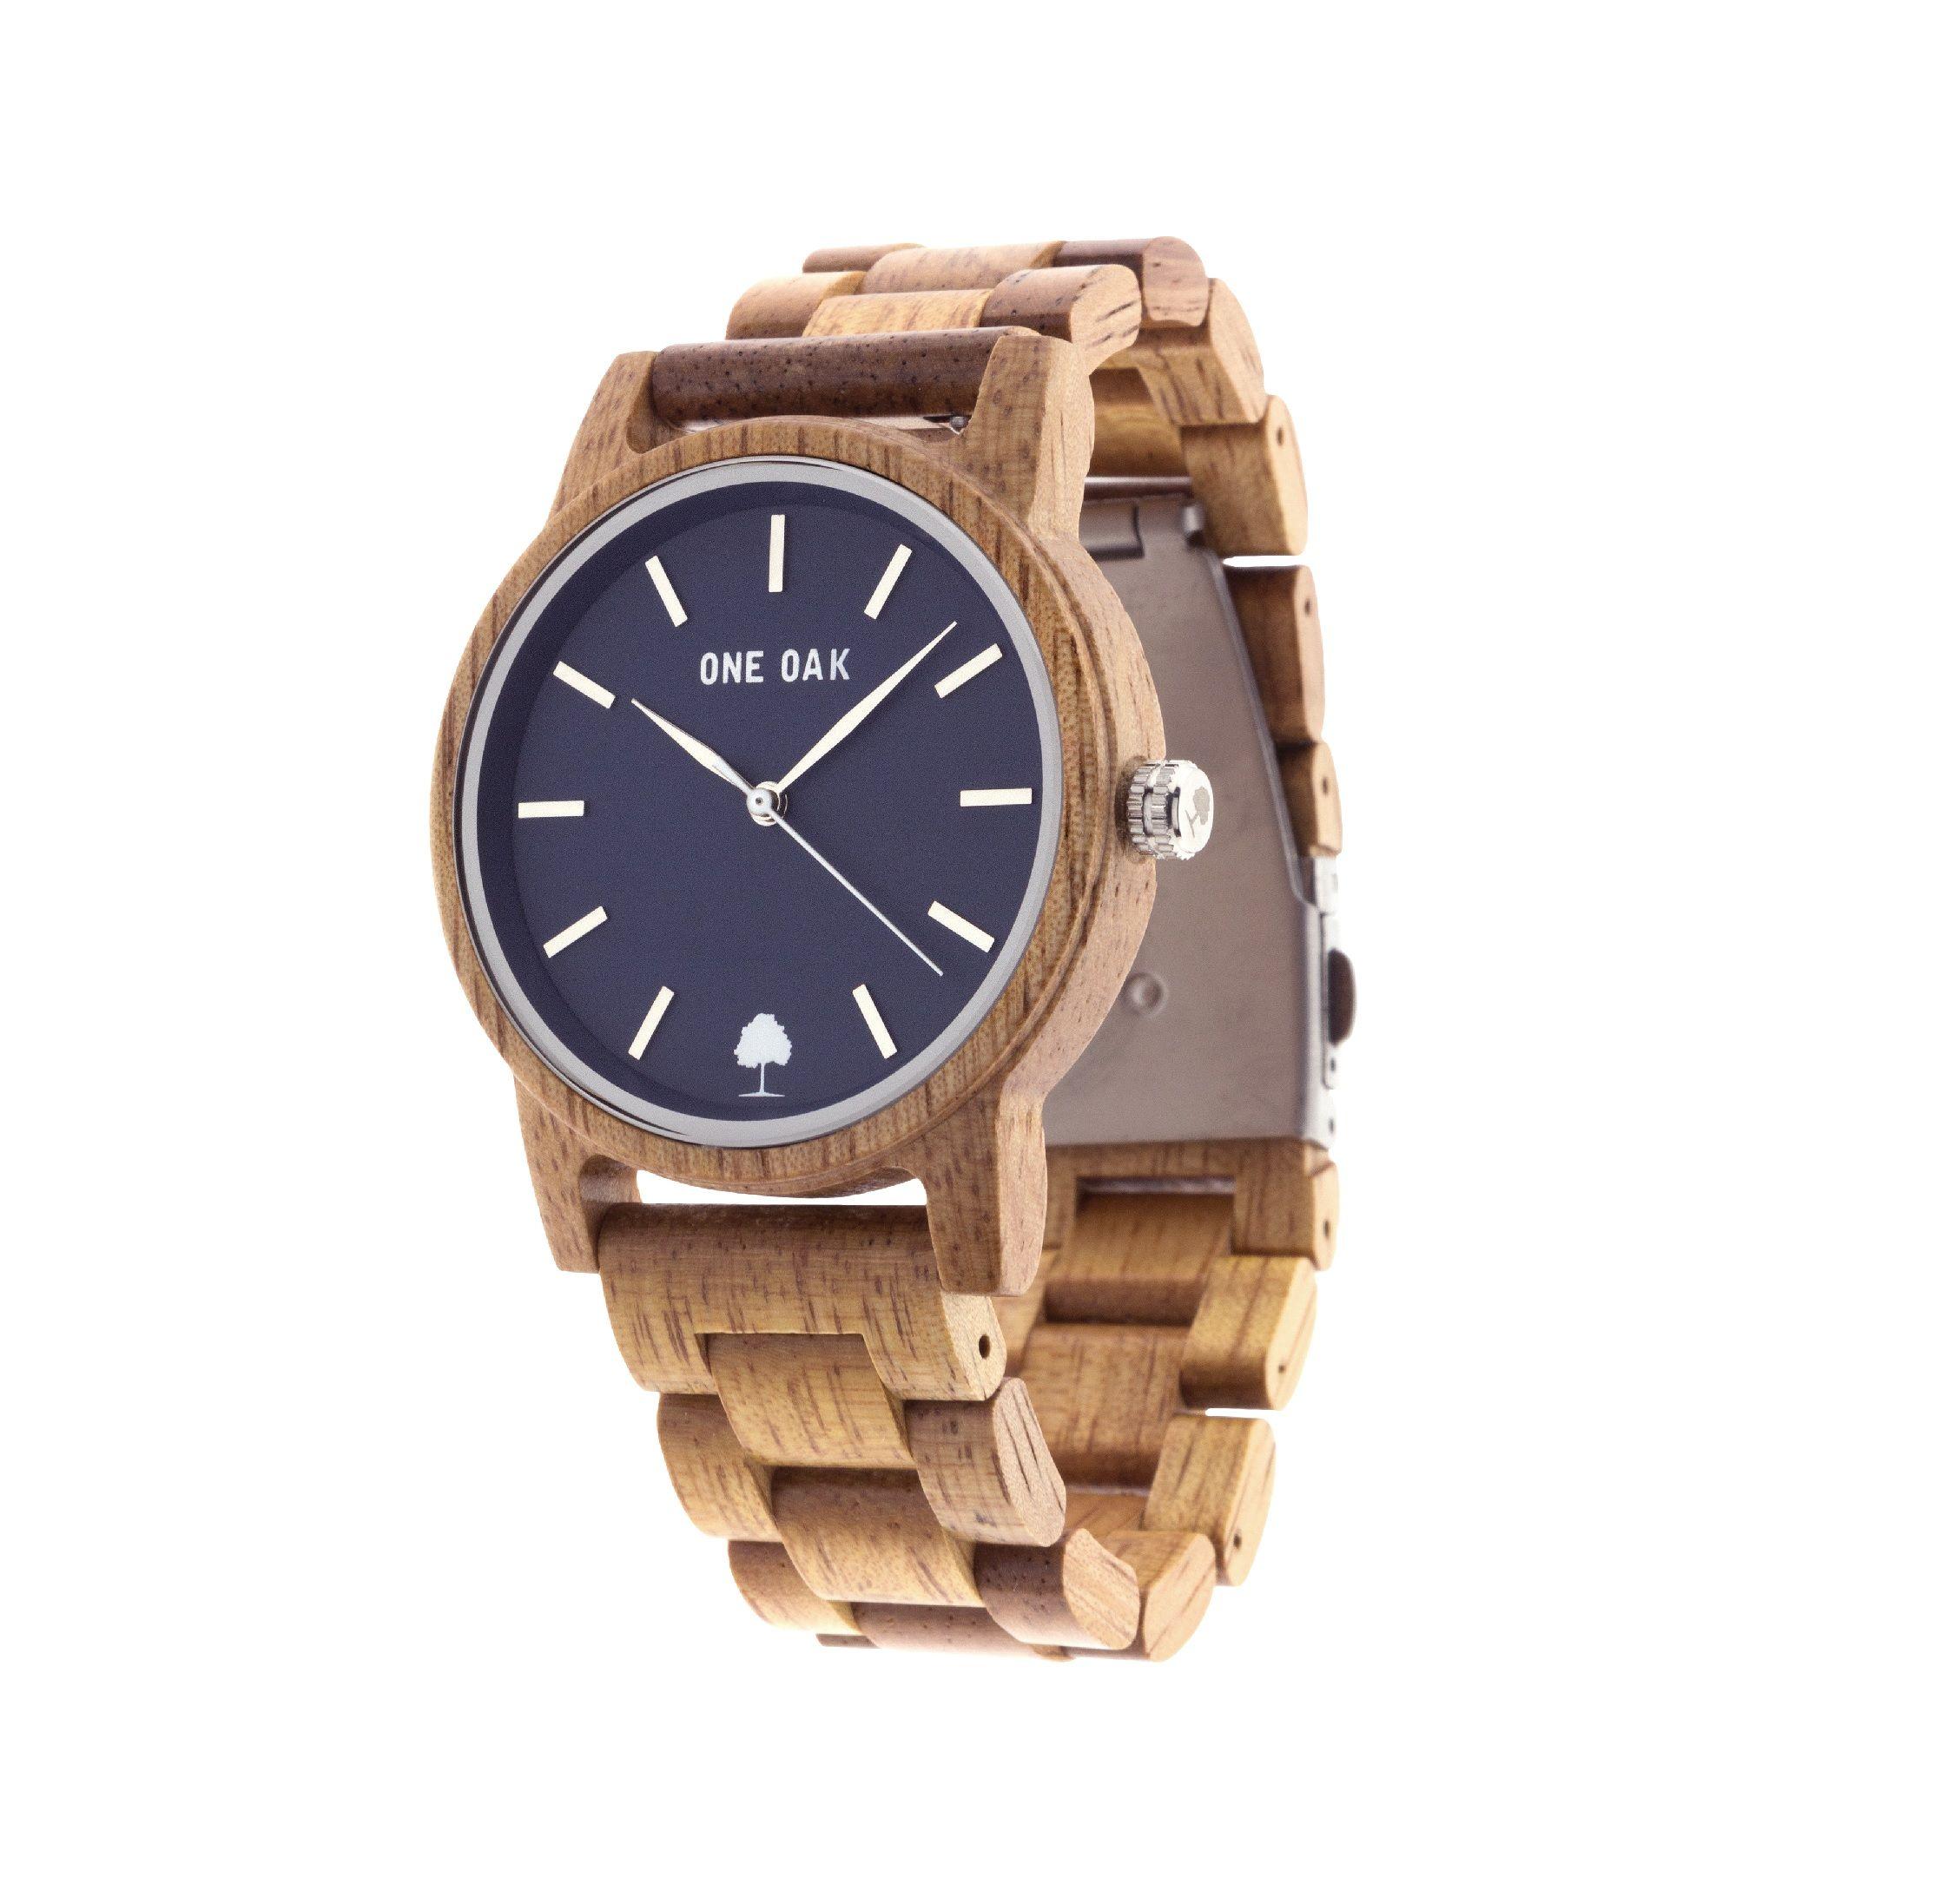 Foto de Reloj de madera One Oak